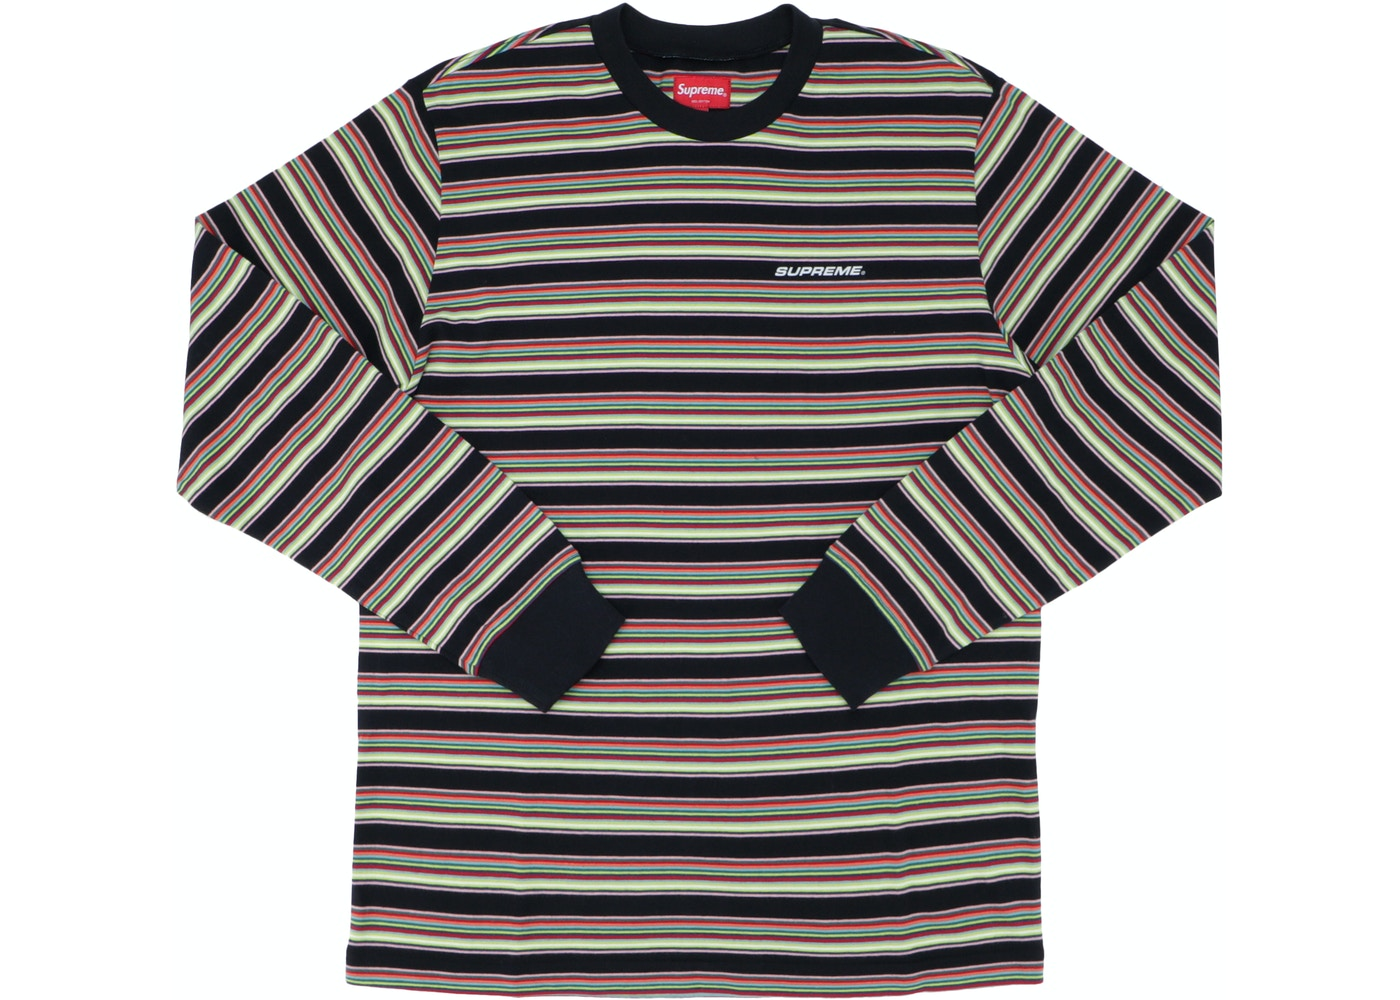 282dd7603d Supreme Multi Stripe L/S Top Black - SS18